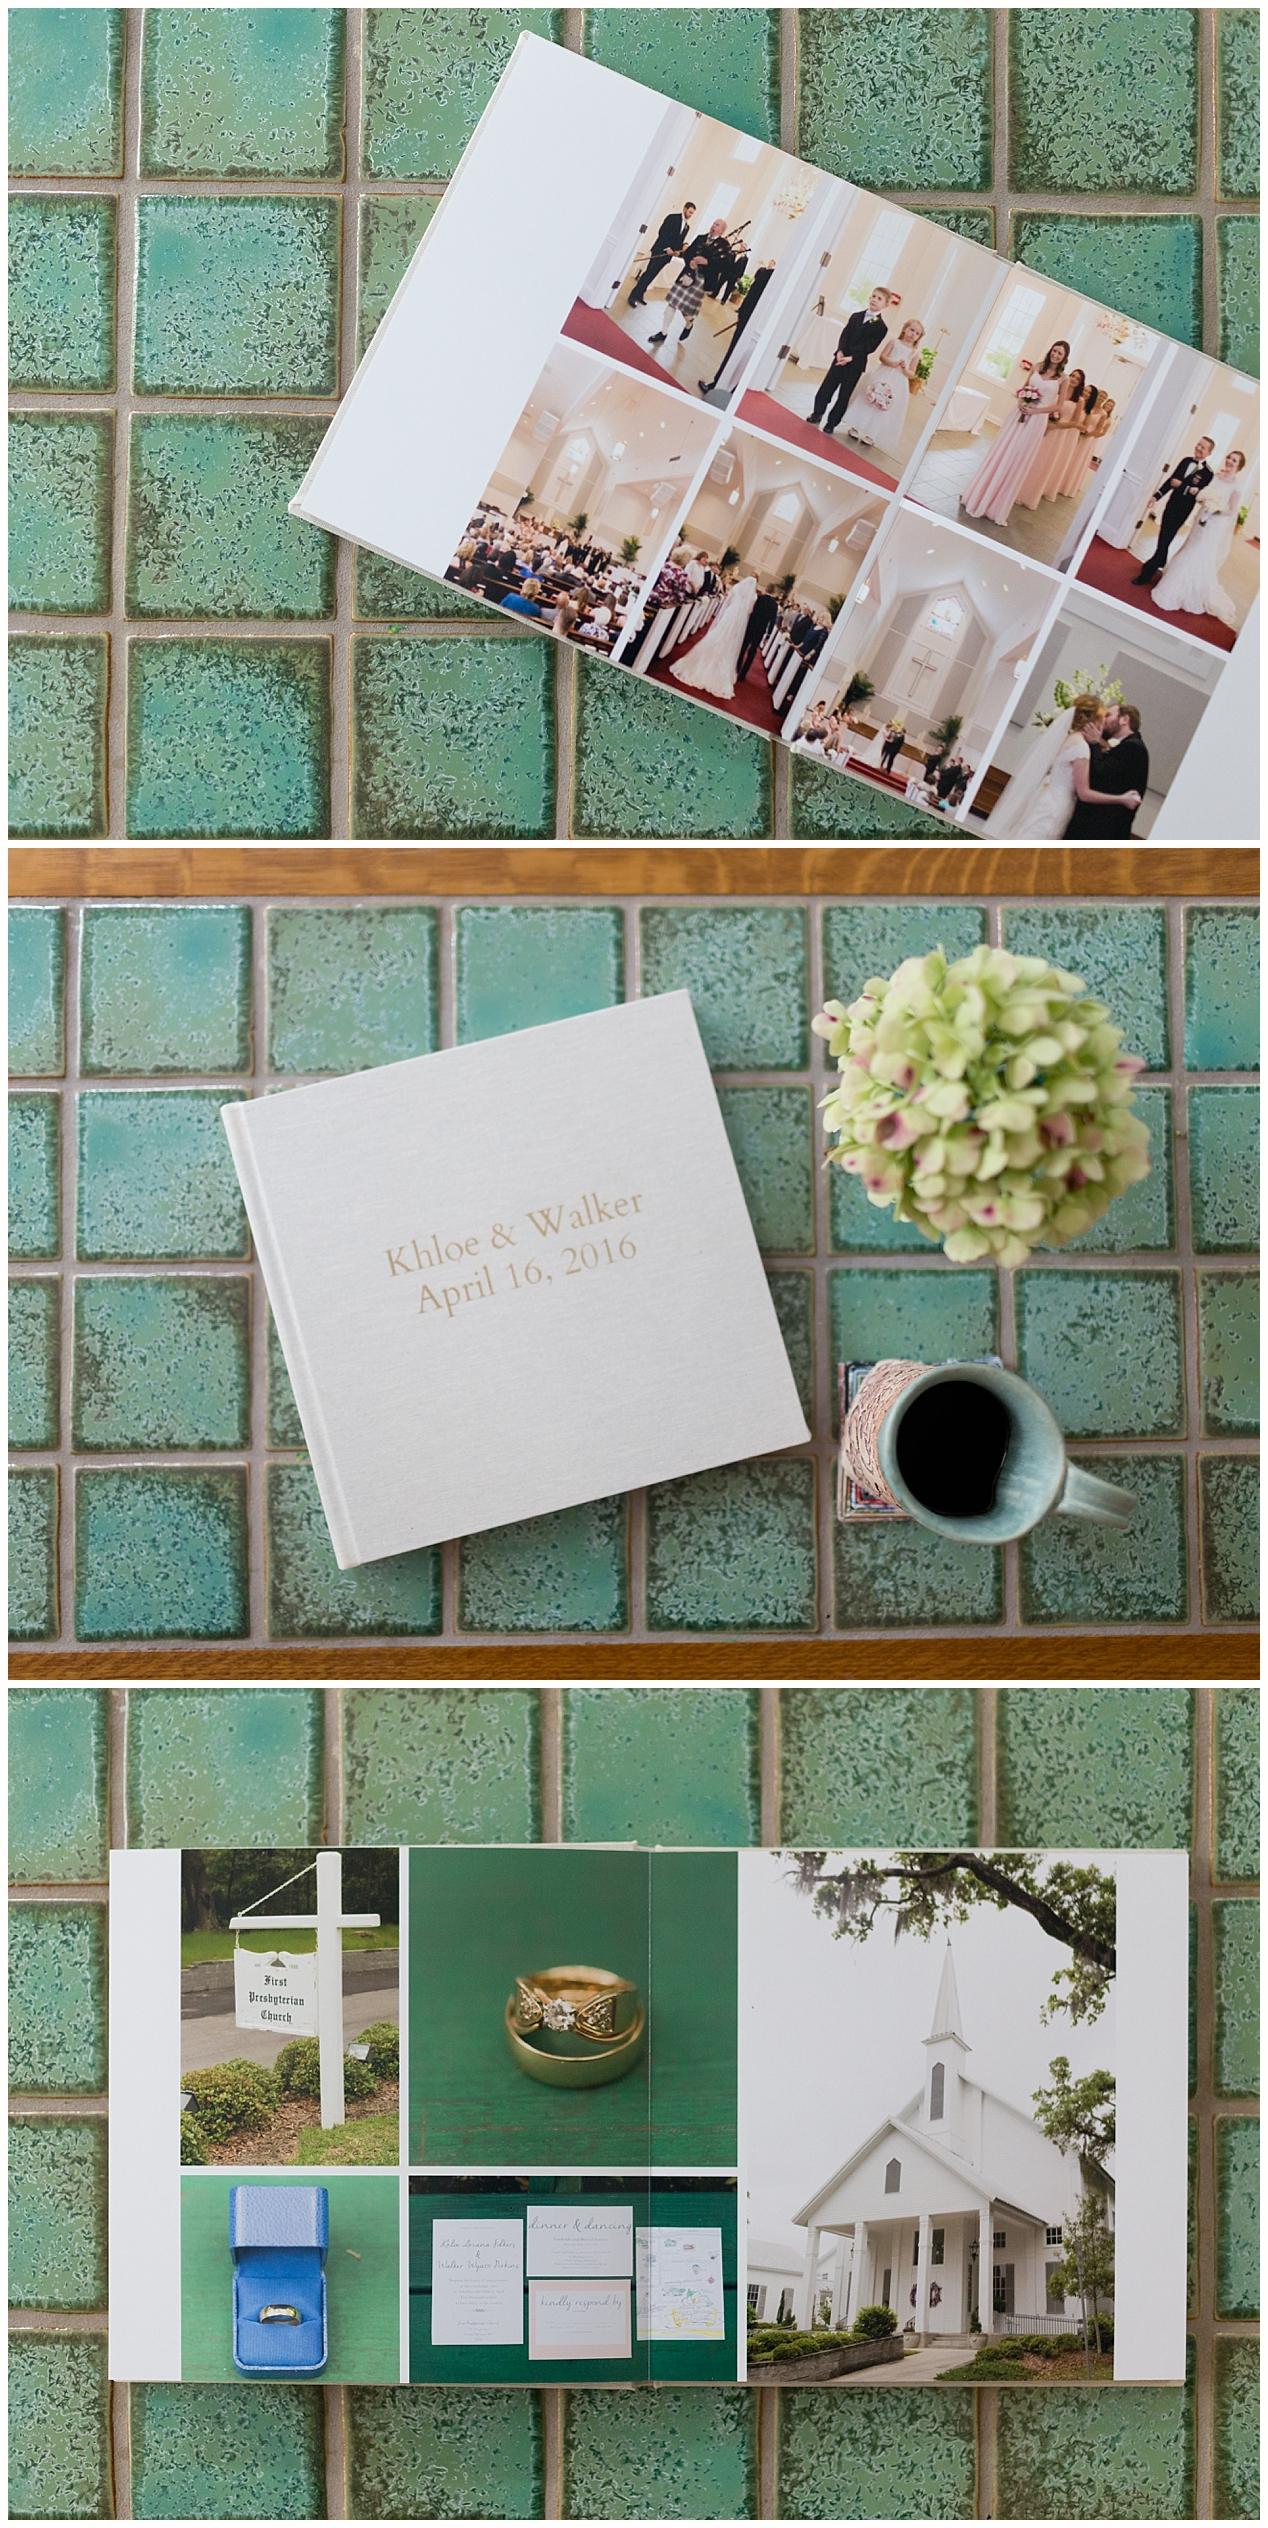 wedding photo album on coffee table - Ocean Springs wedding photography album